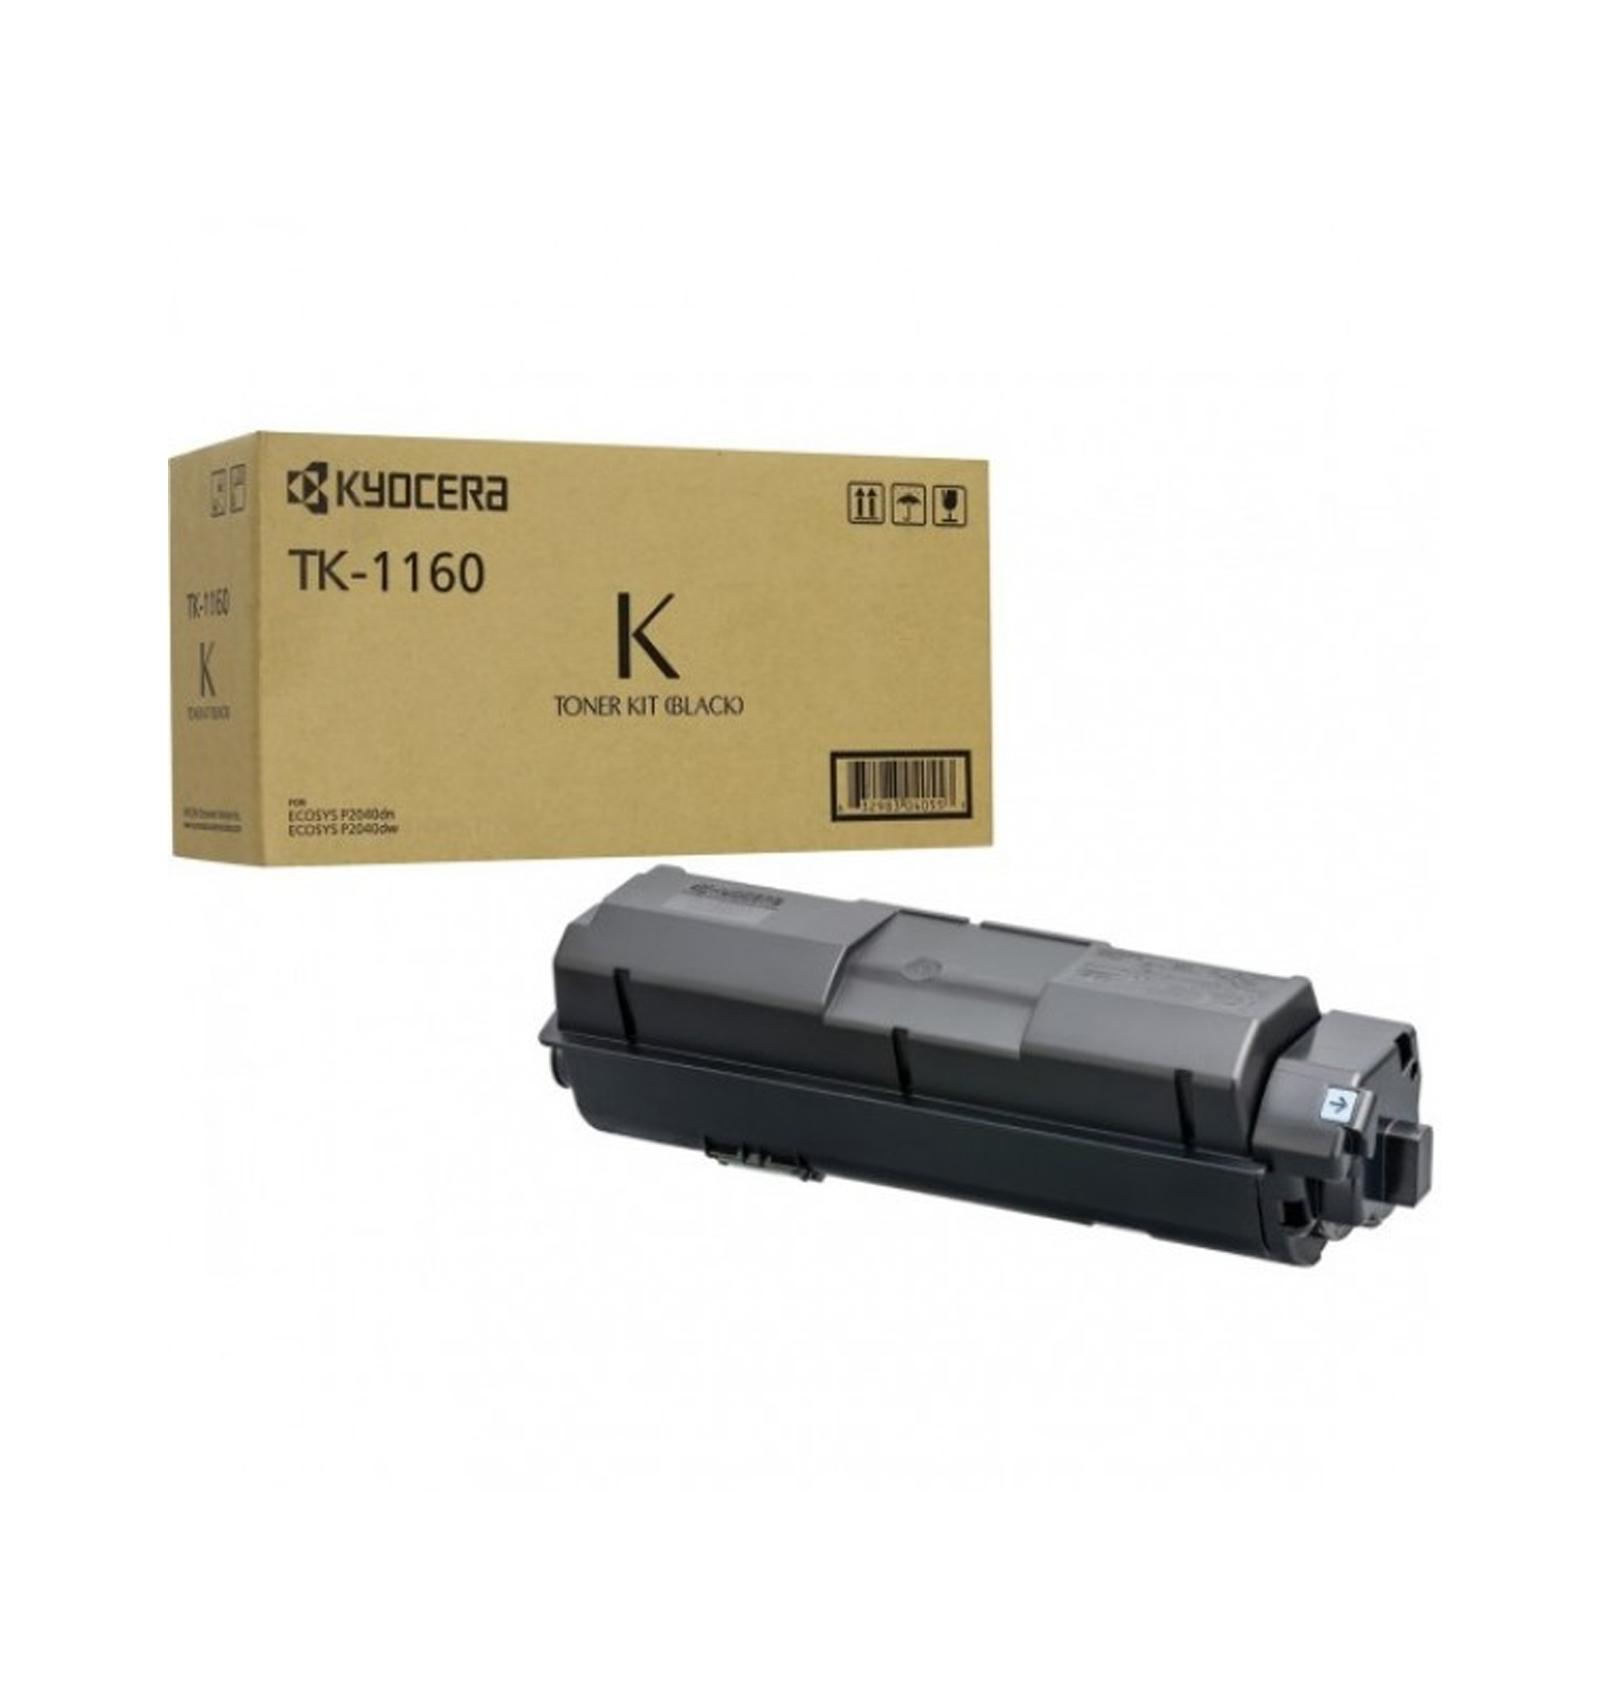 Kyocera TK-1160 для Kyocera ECOSYS P2040dn / P2040dw